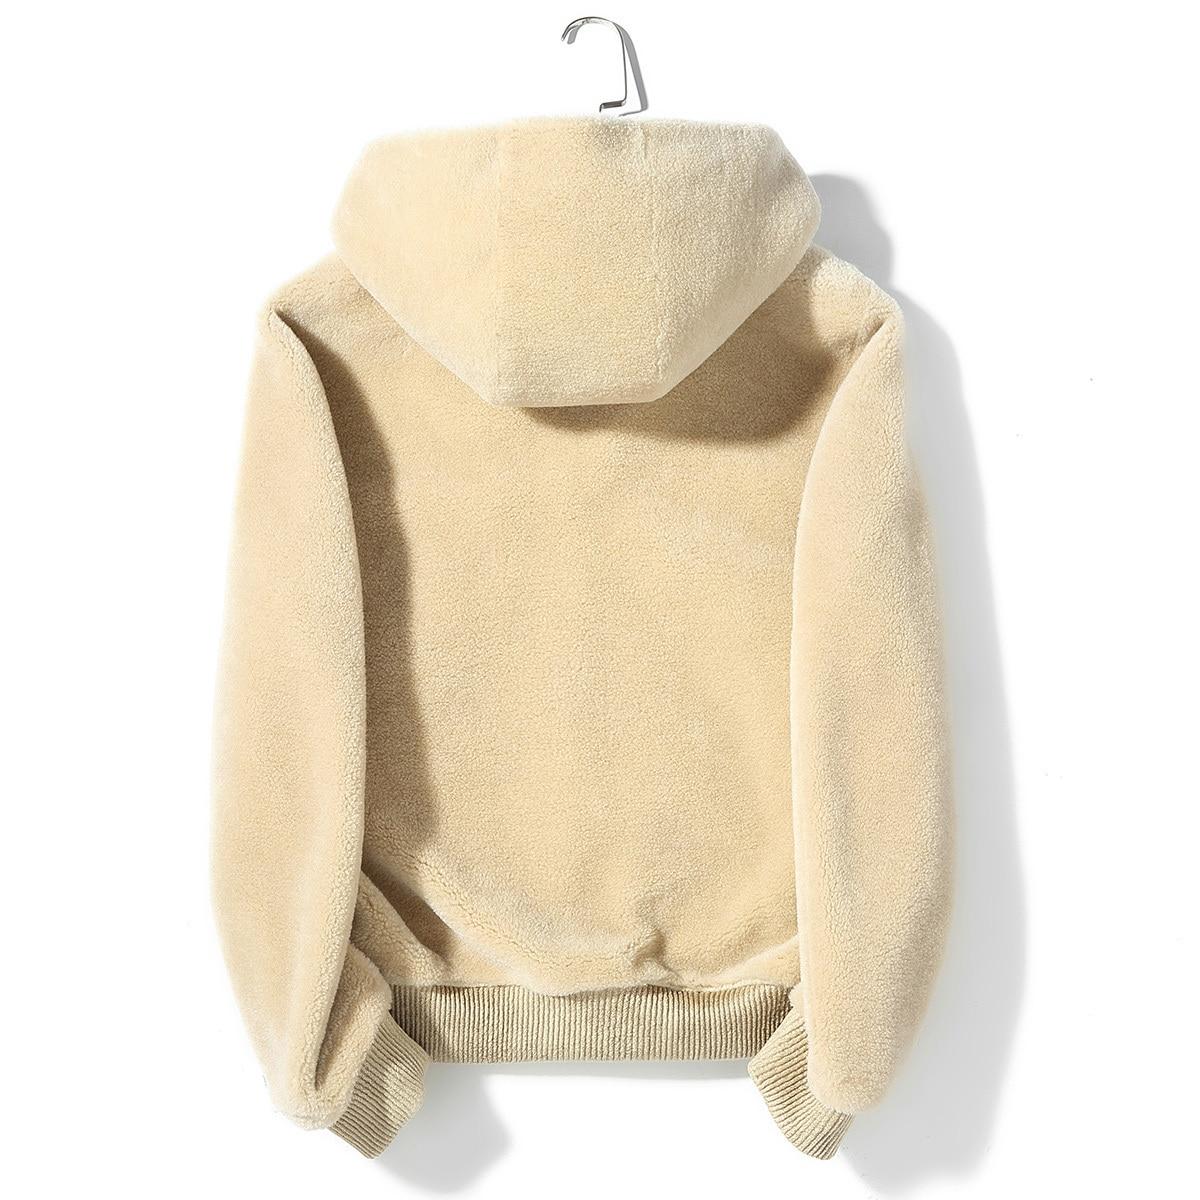 Real Fur Coat Men Hooded Short Autumn Winter Jacket Sheep Shearing 100% Wool Fur Coat Chaqueta Hombre Invierno K9SYJI003